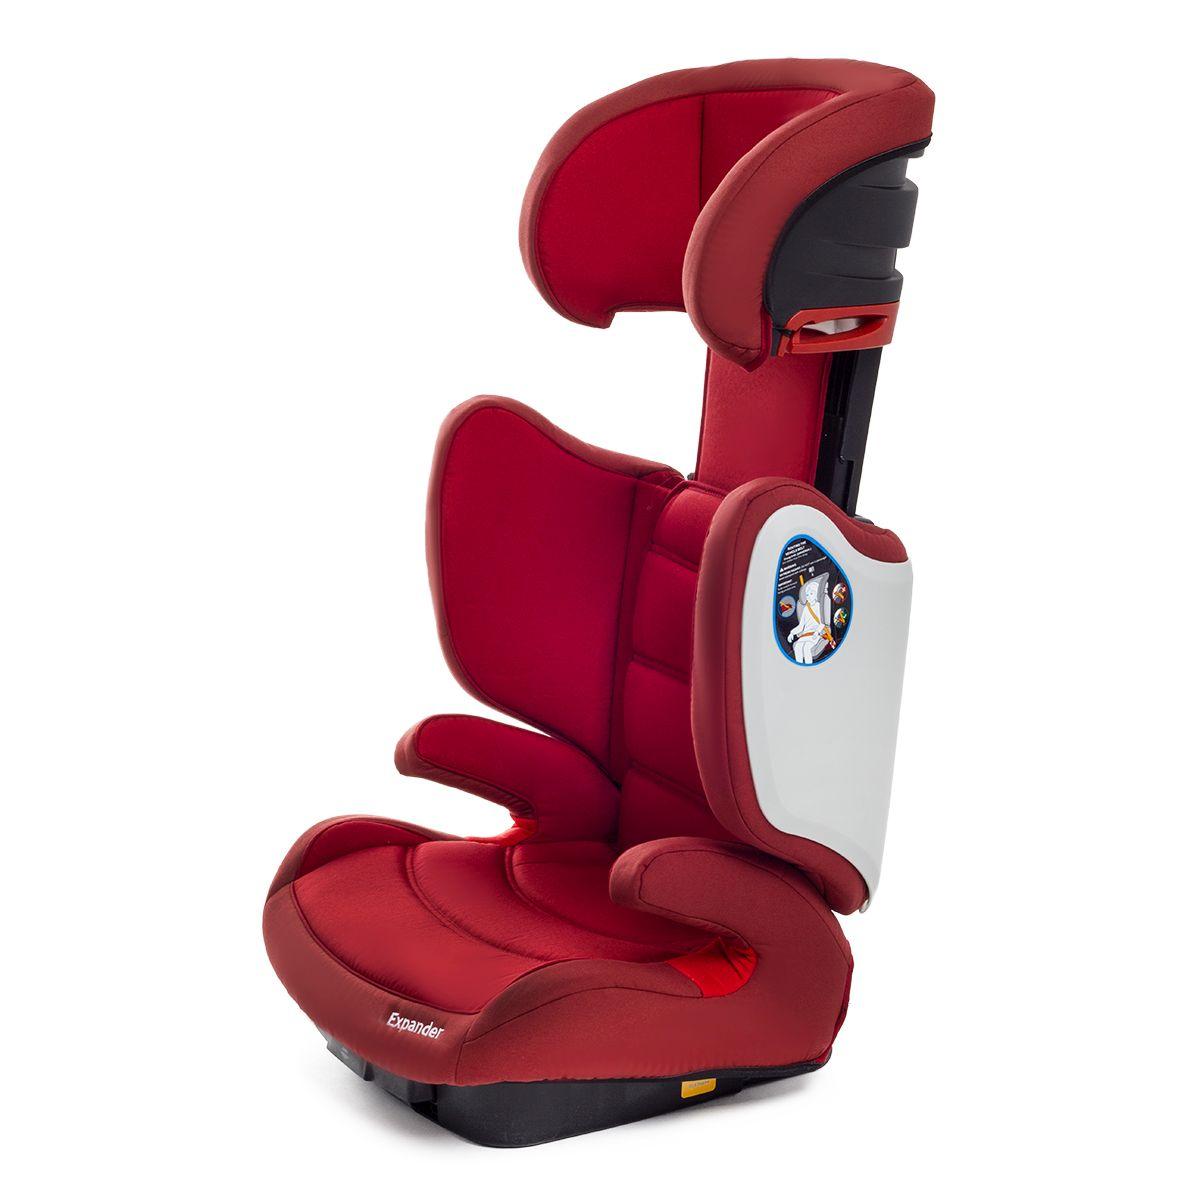 Infant car seat isofix child seat car seat 15 bis 36 kg - Rehausseur auto inclinable ...